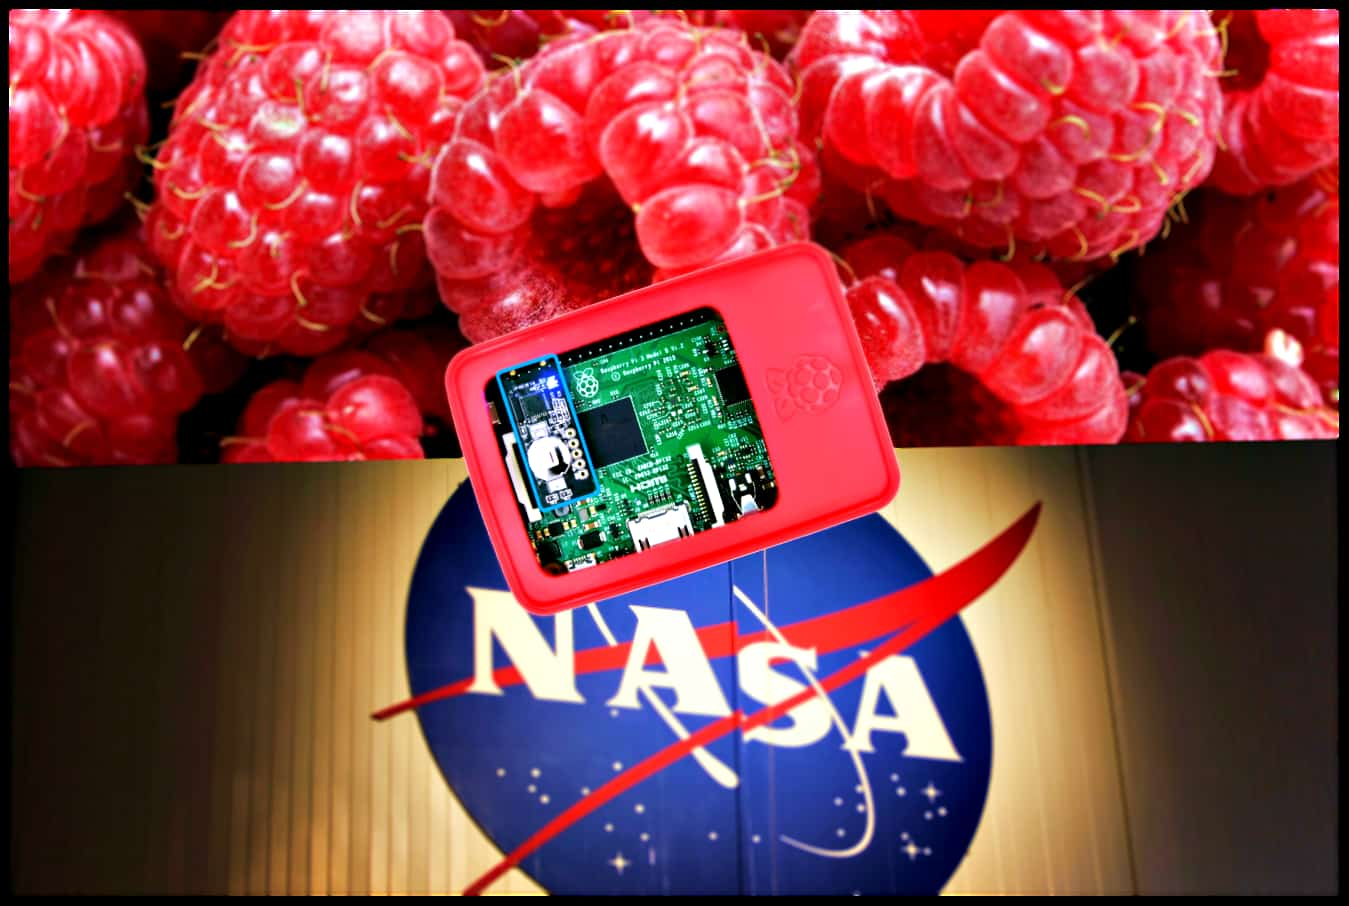 Hackers exploit Raspberry Pi device to hack NASA's mission